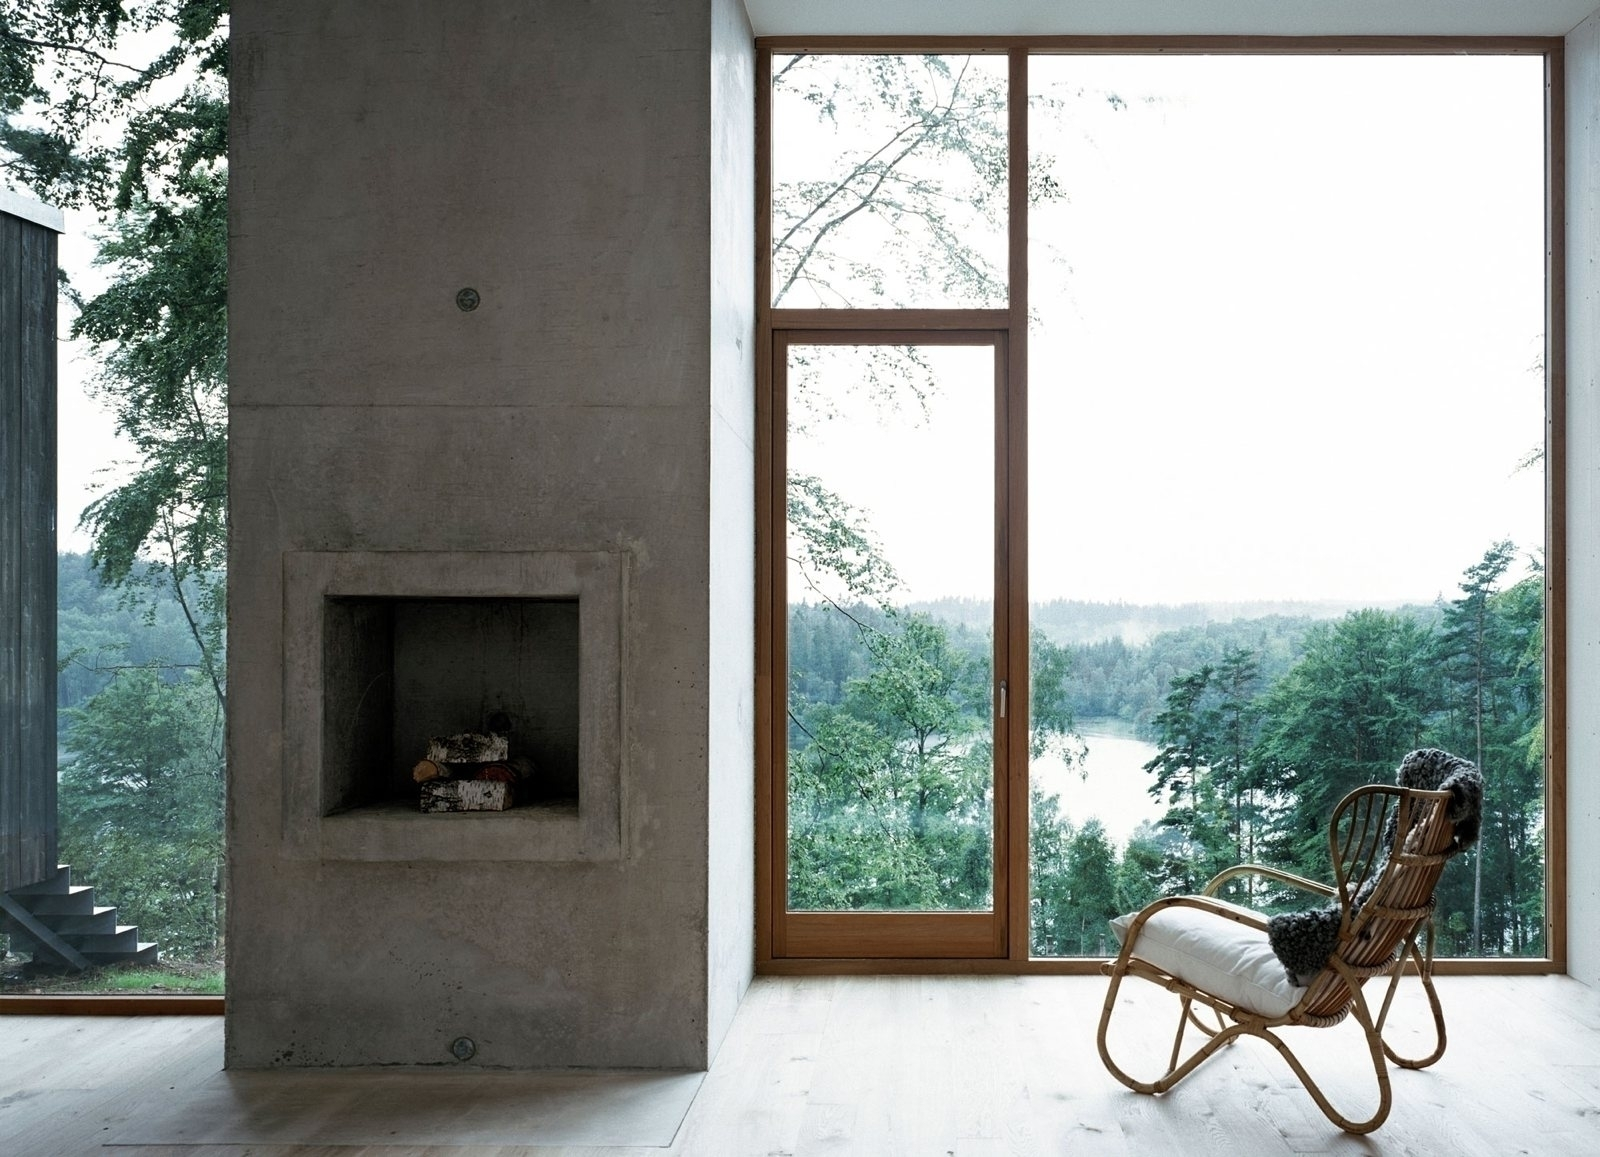 Concrete fireplace large window - upinteriors | ello